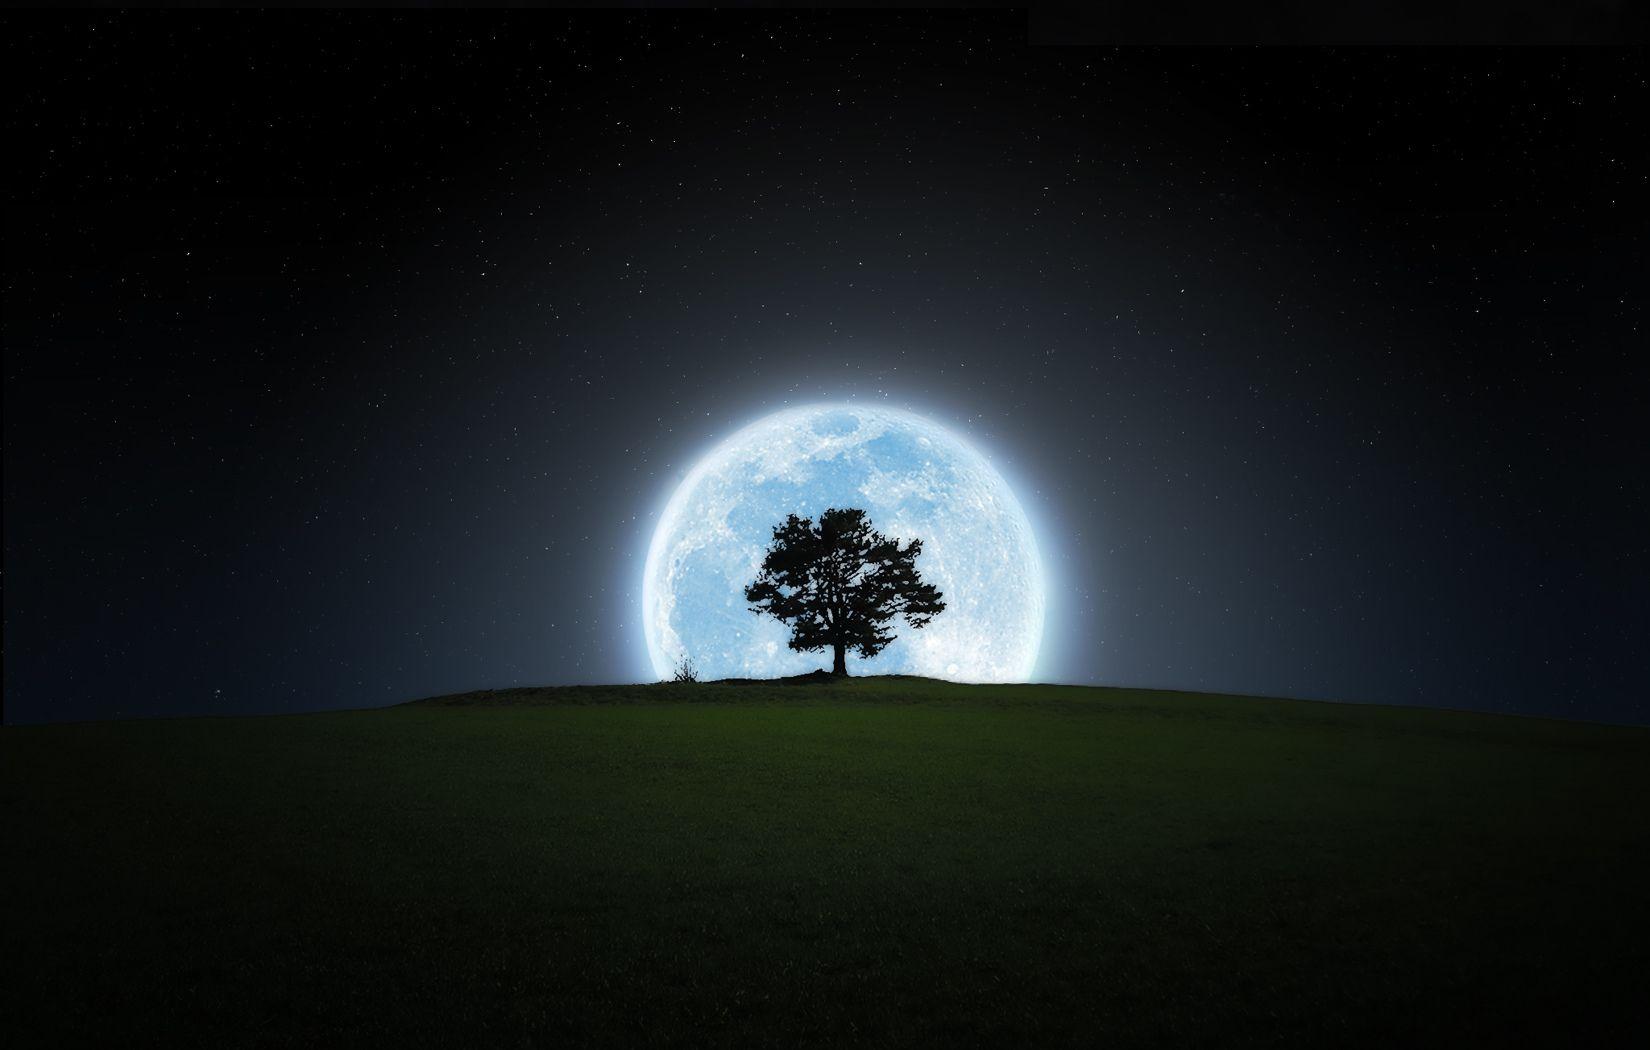 Earth Moon Silhouette Night Tree Wallpaper Background Images Wallpapers Wallpaper Backgrounds Background Images Hd wallpaper trees silhouette night moon